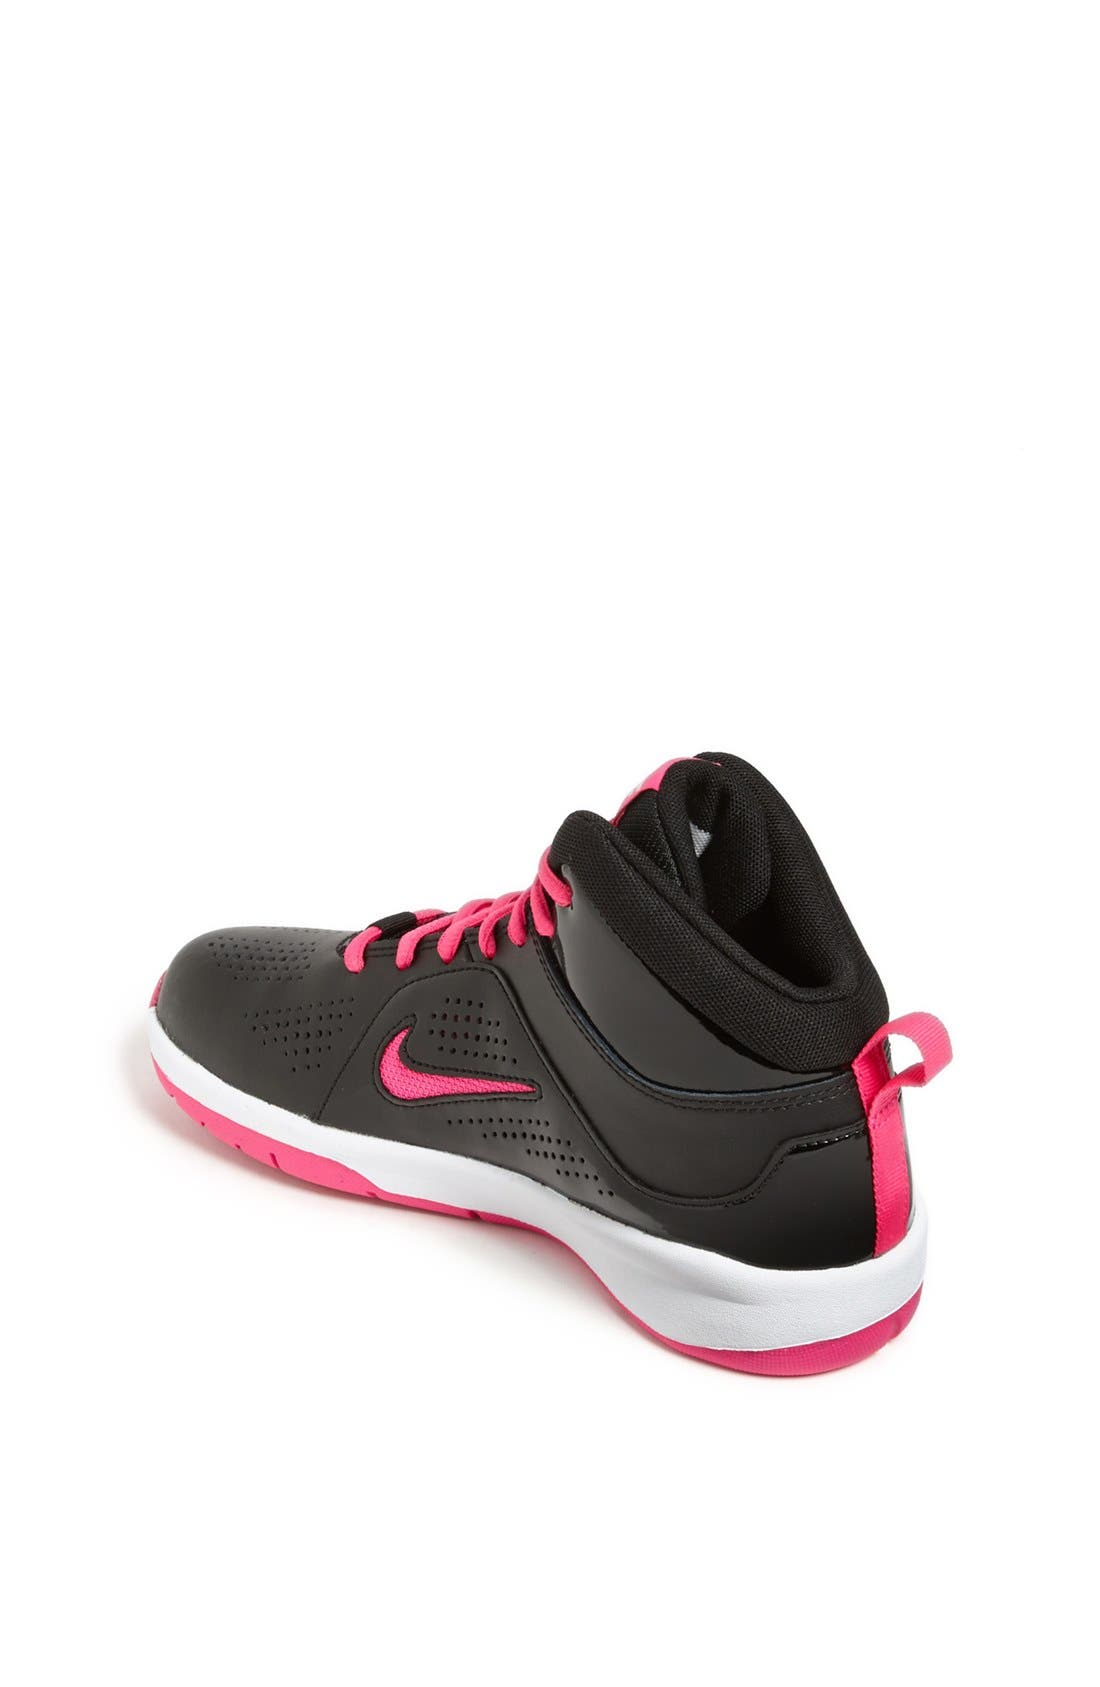 Alternate Image 2  - Nike 'Team Hustle' Basketball Shoe (Toddler, Little Kid & Big Kid)